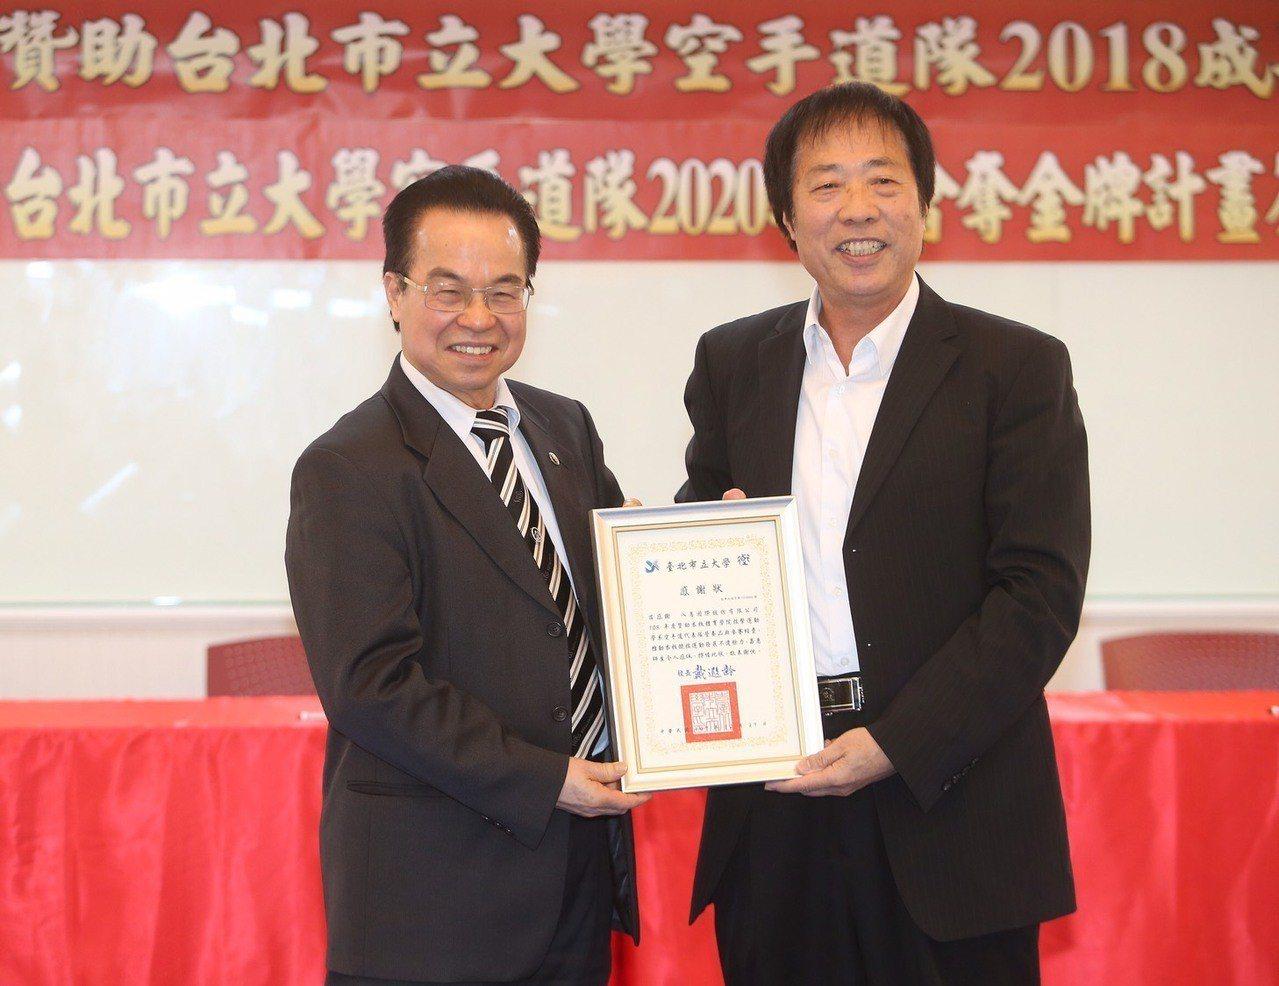 Total Swiss贊助台北市立大學空手道隊今舉行簽約儀式。圖/主辦單位提供